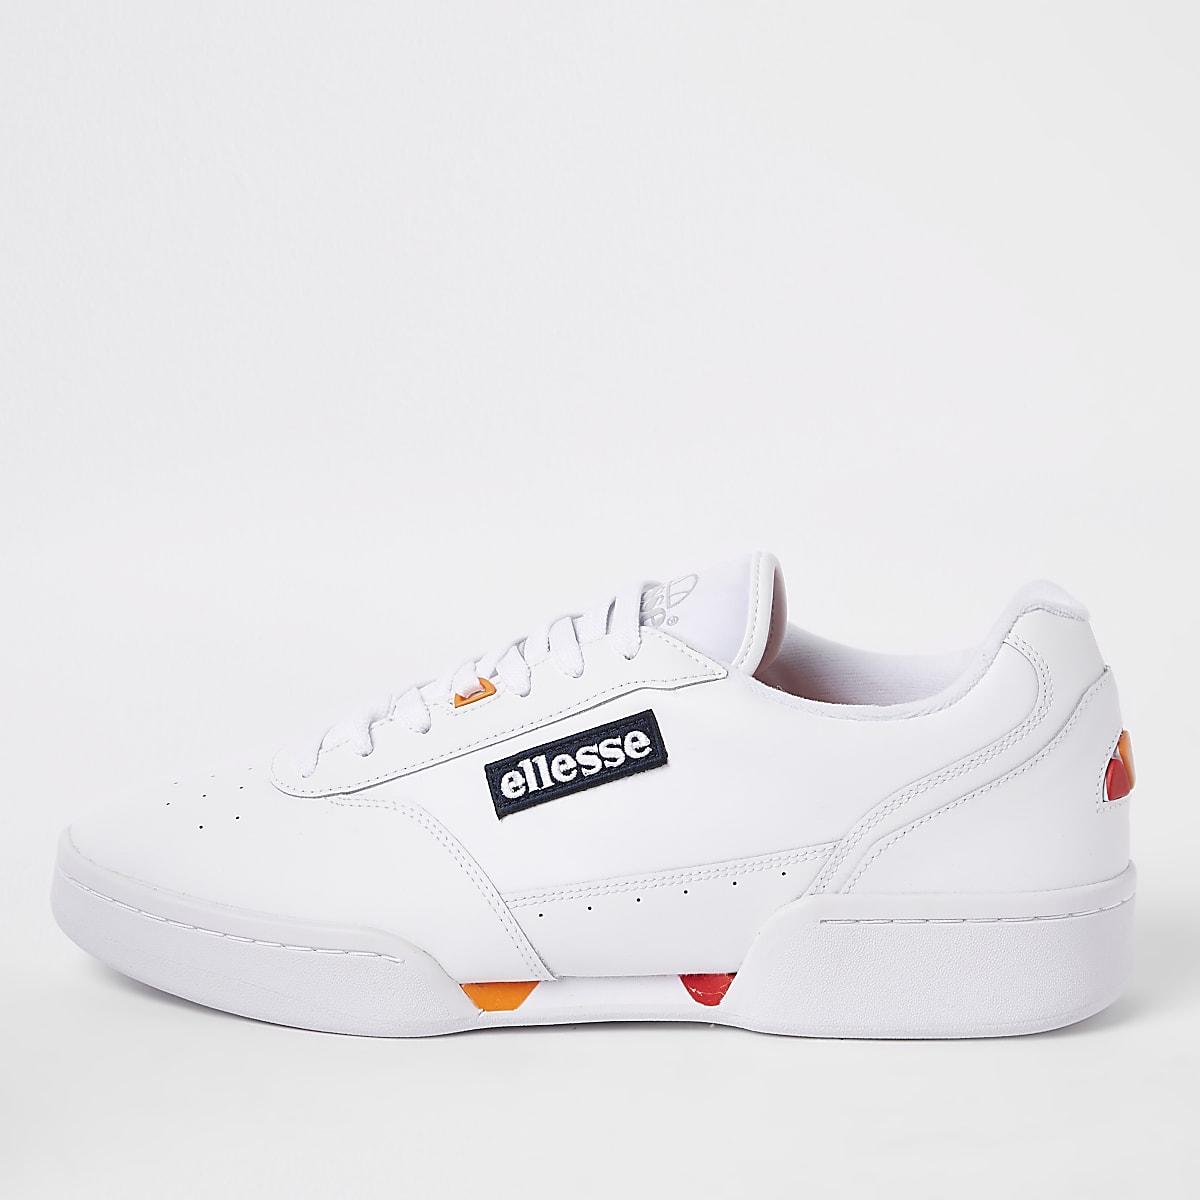 Ellesse – Piacentino – Weiße Sneaker aus Ledr